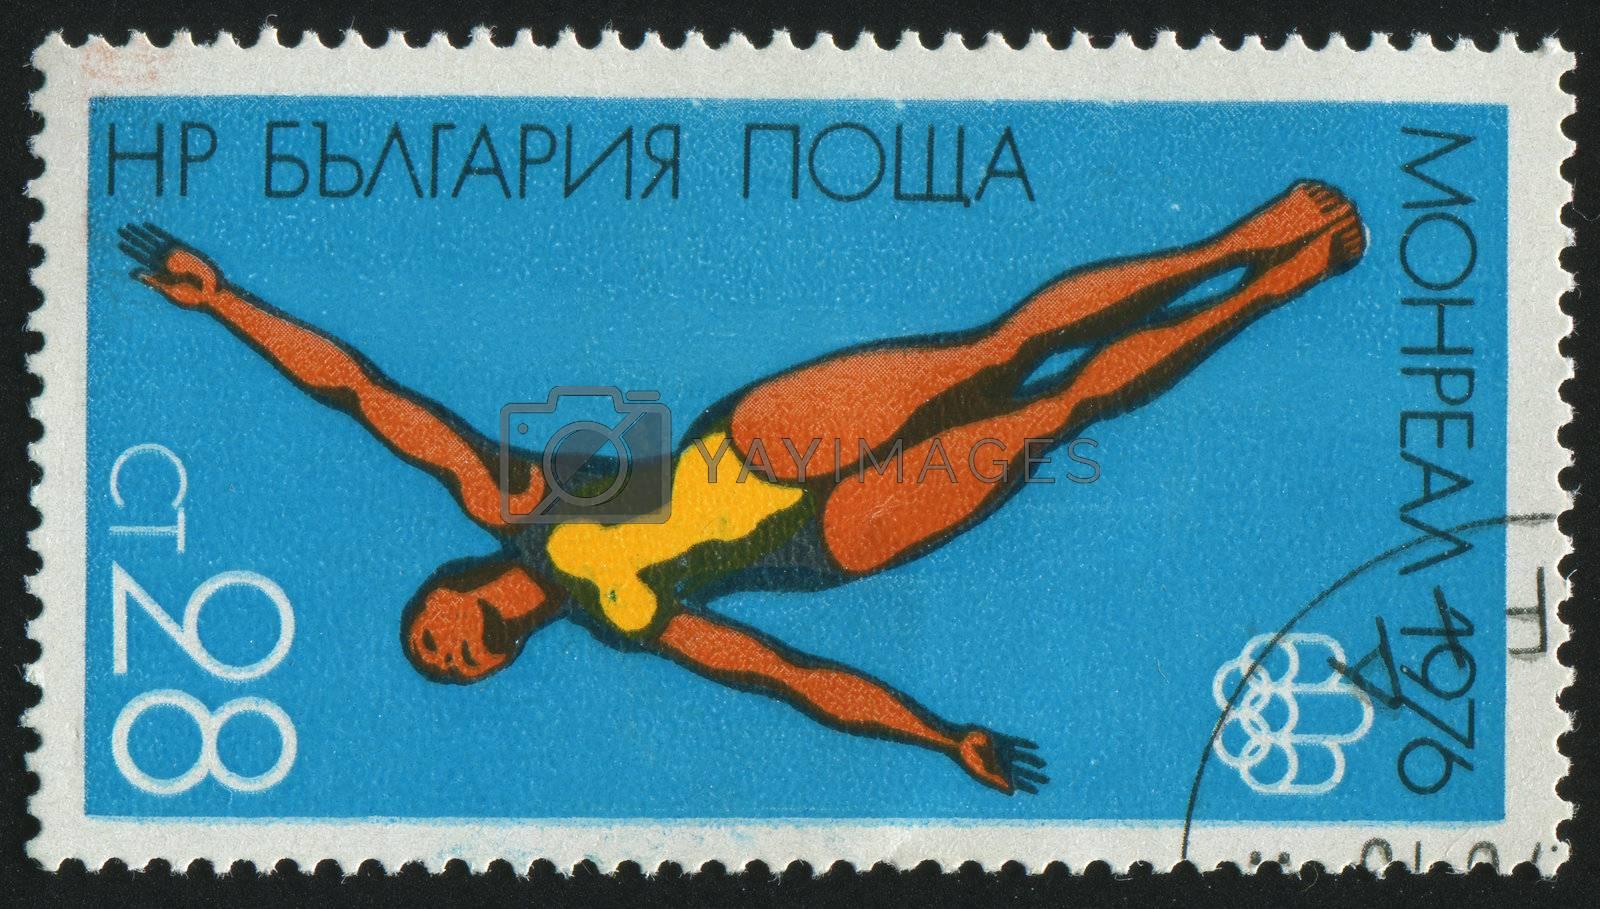 BULGARIA - CIRCA 1976: stamp printed by Bulgaria, shows woman diver, circa 1976.